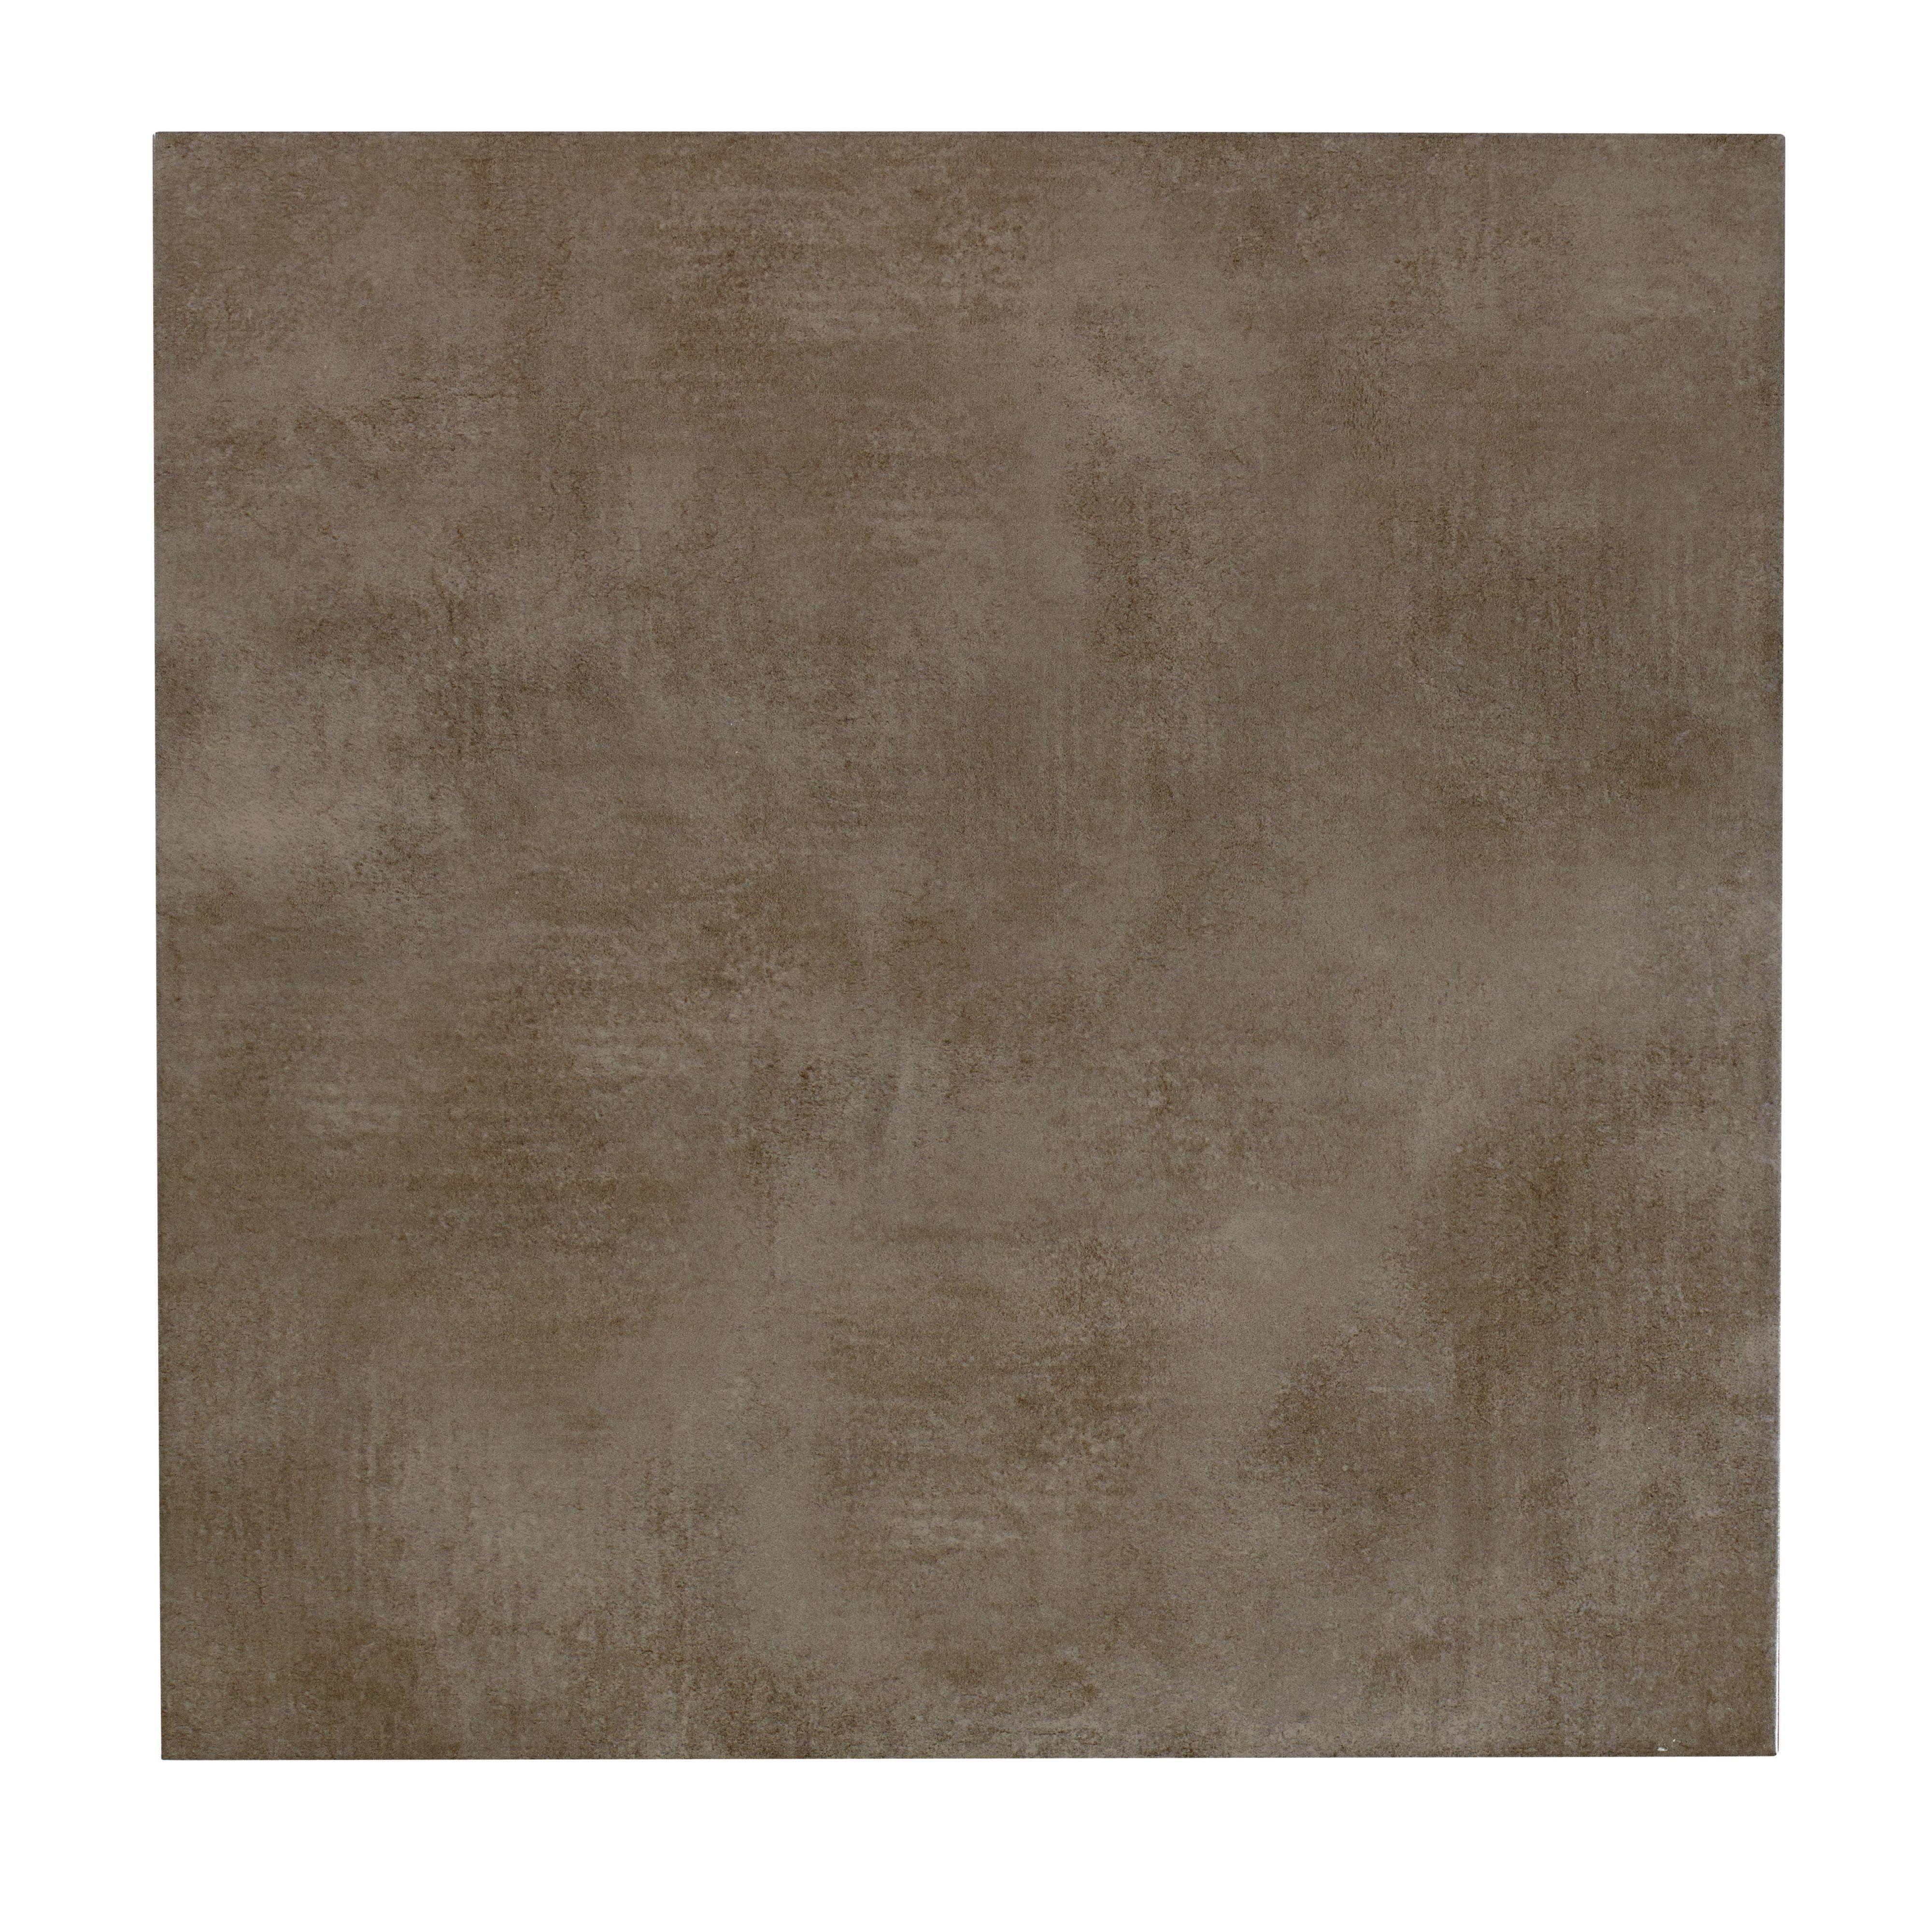 Underground Black Ceramic Wall Tile Pack Of 50 L 200mm: Cara White & Silver Ceramic Border Tile, (L)200mm (W)50mm